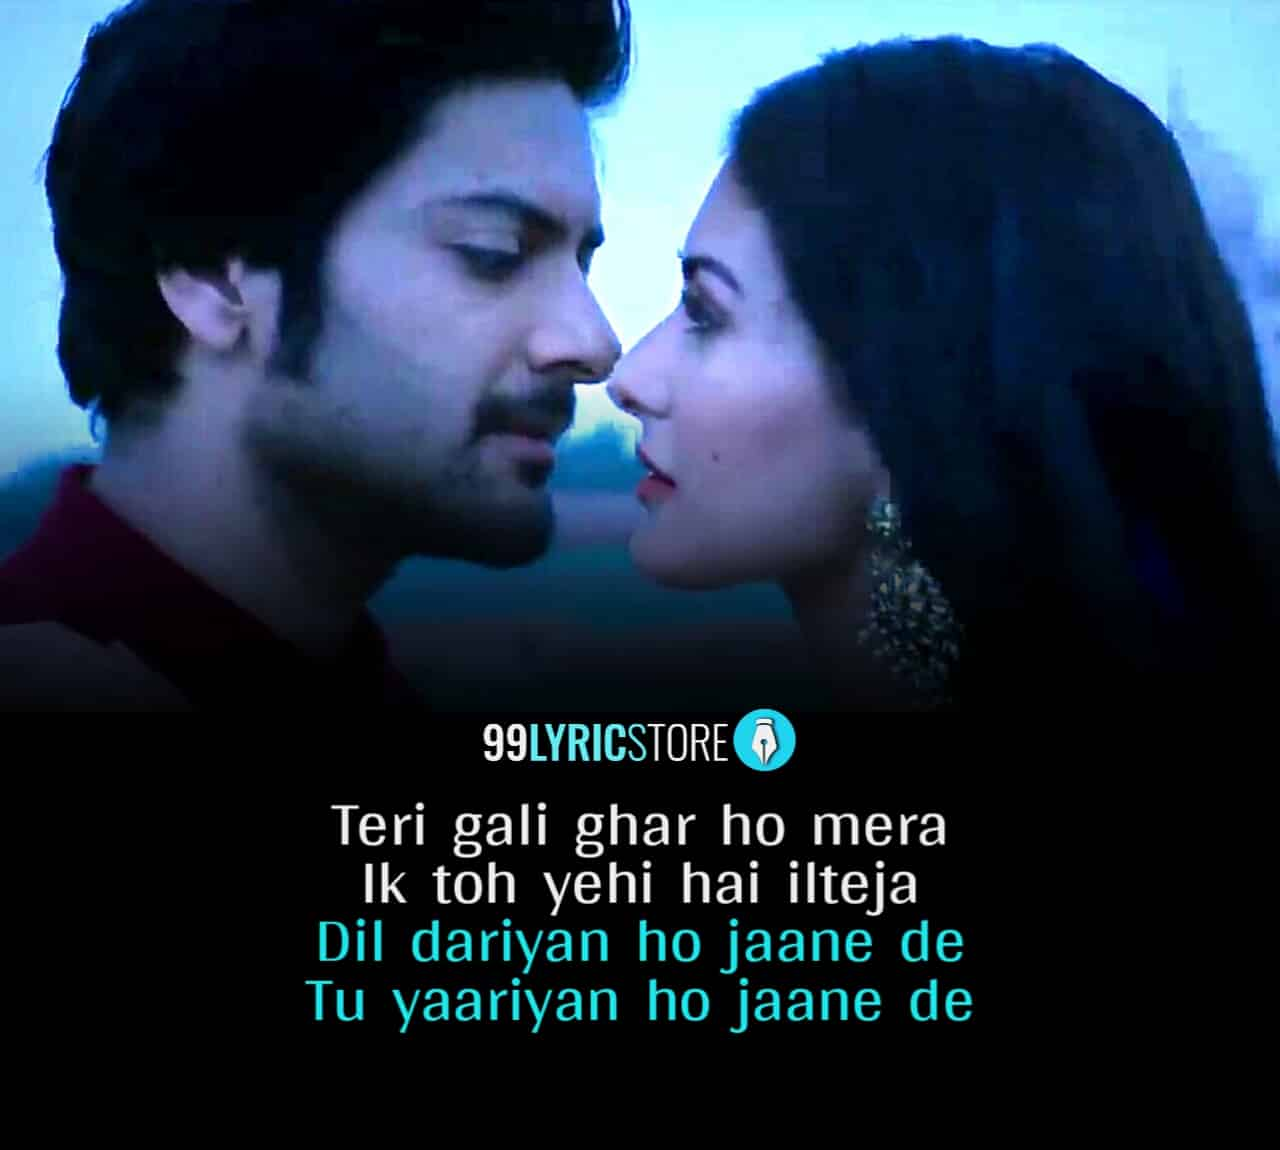 Dil Dariyan song sung by Ankit Tiwari and Deepali Sathe